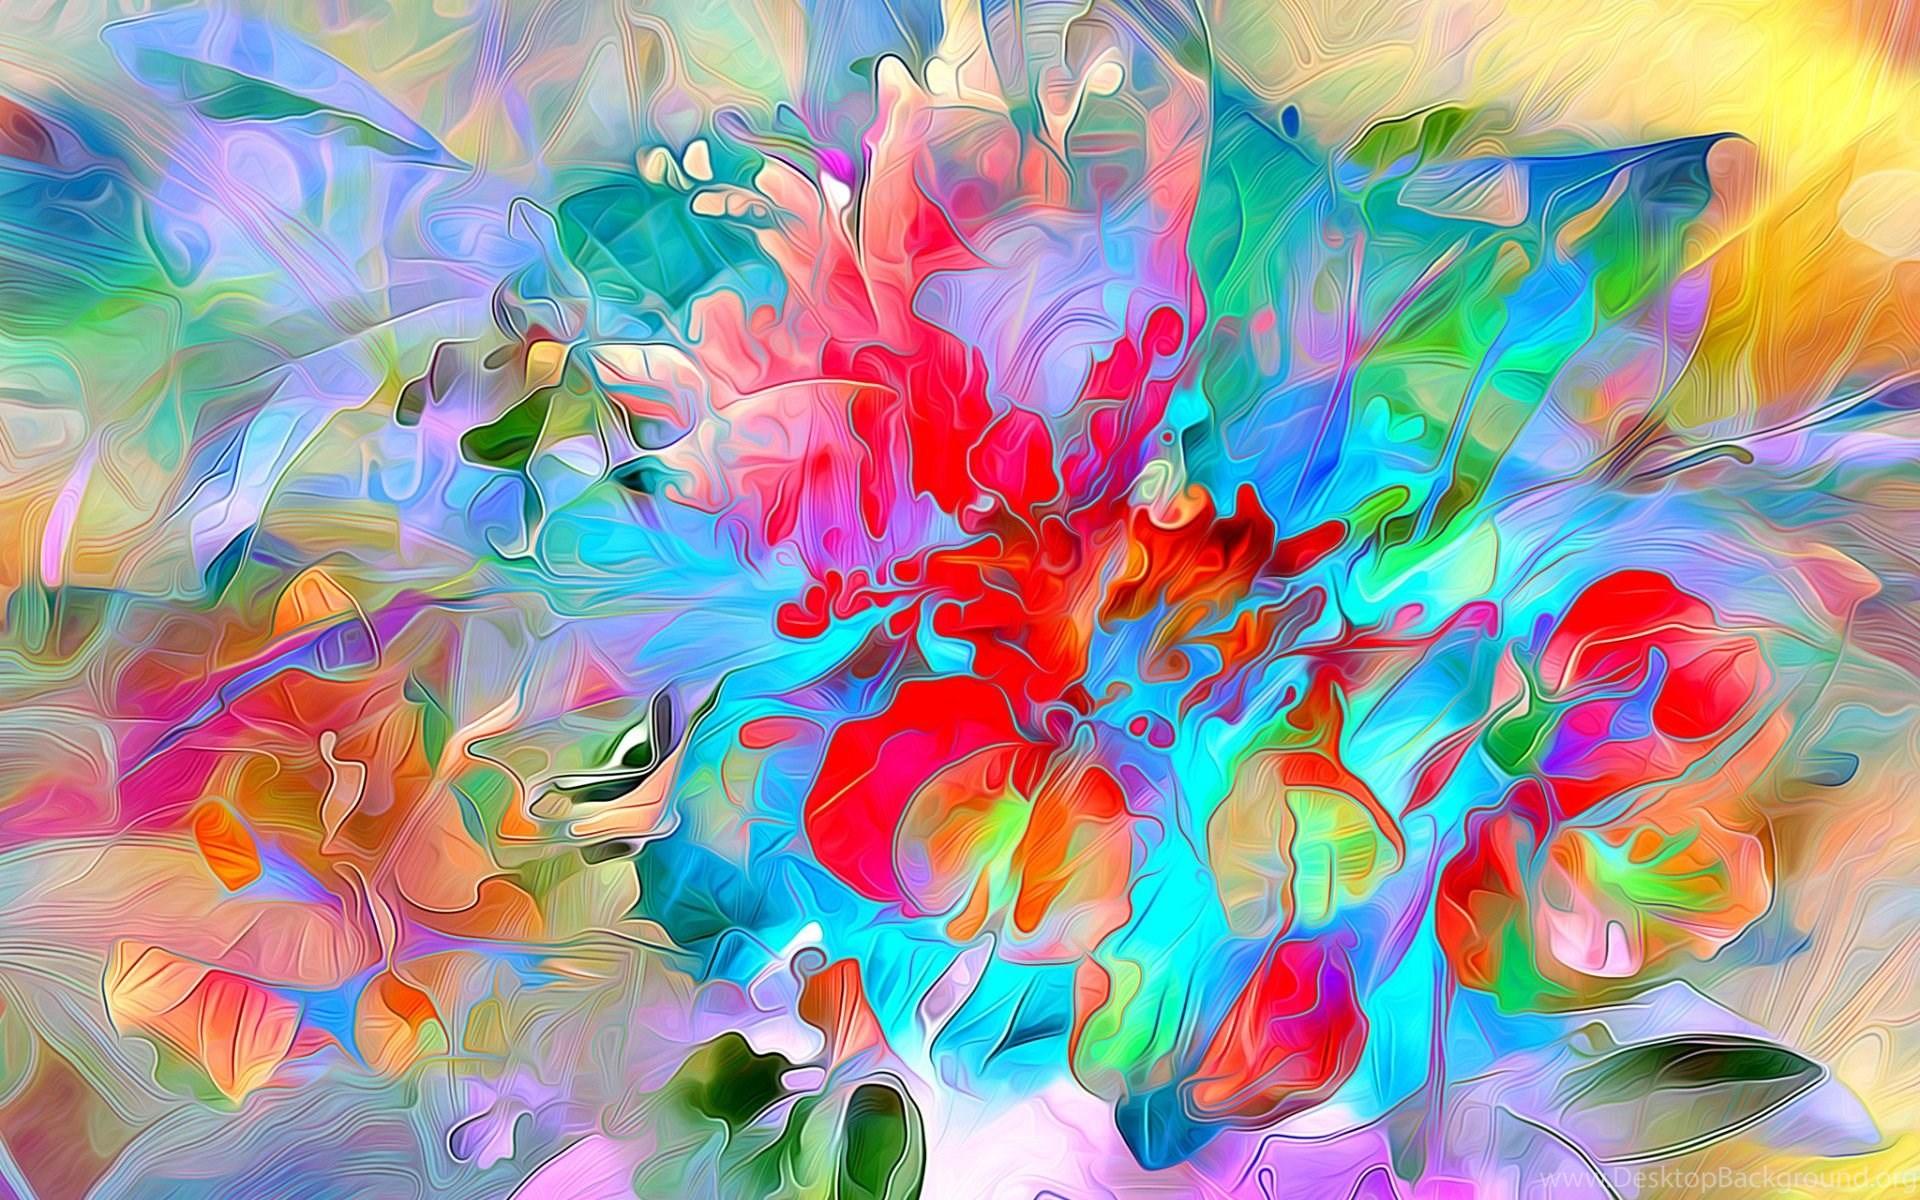 rainbow color splash backgrounds wallpapers download hd